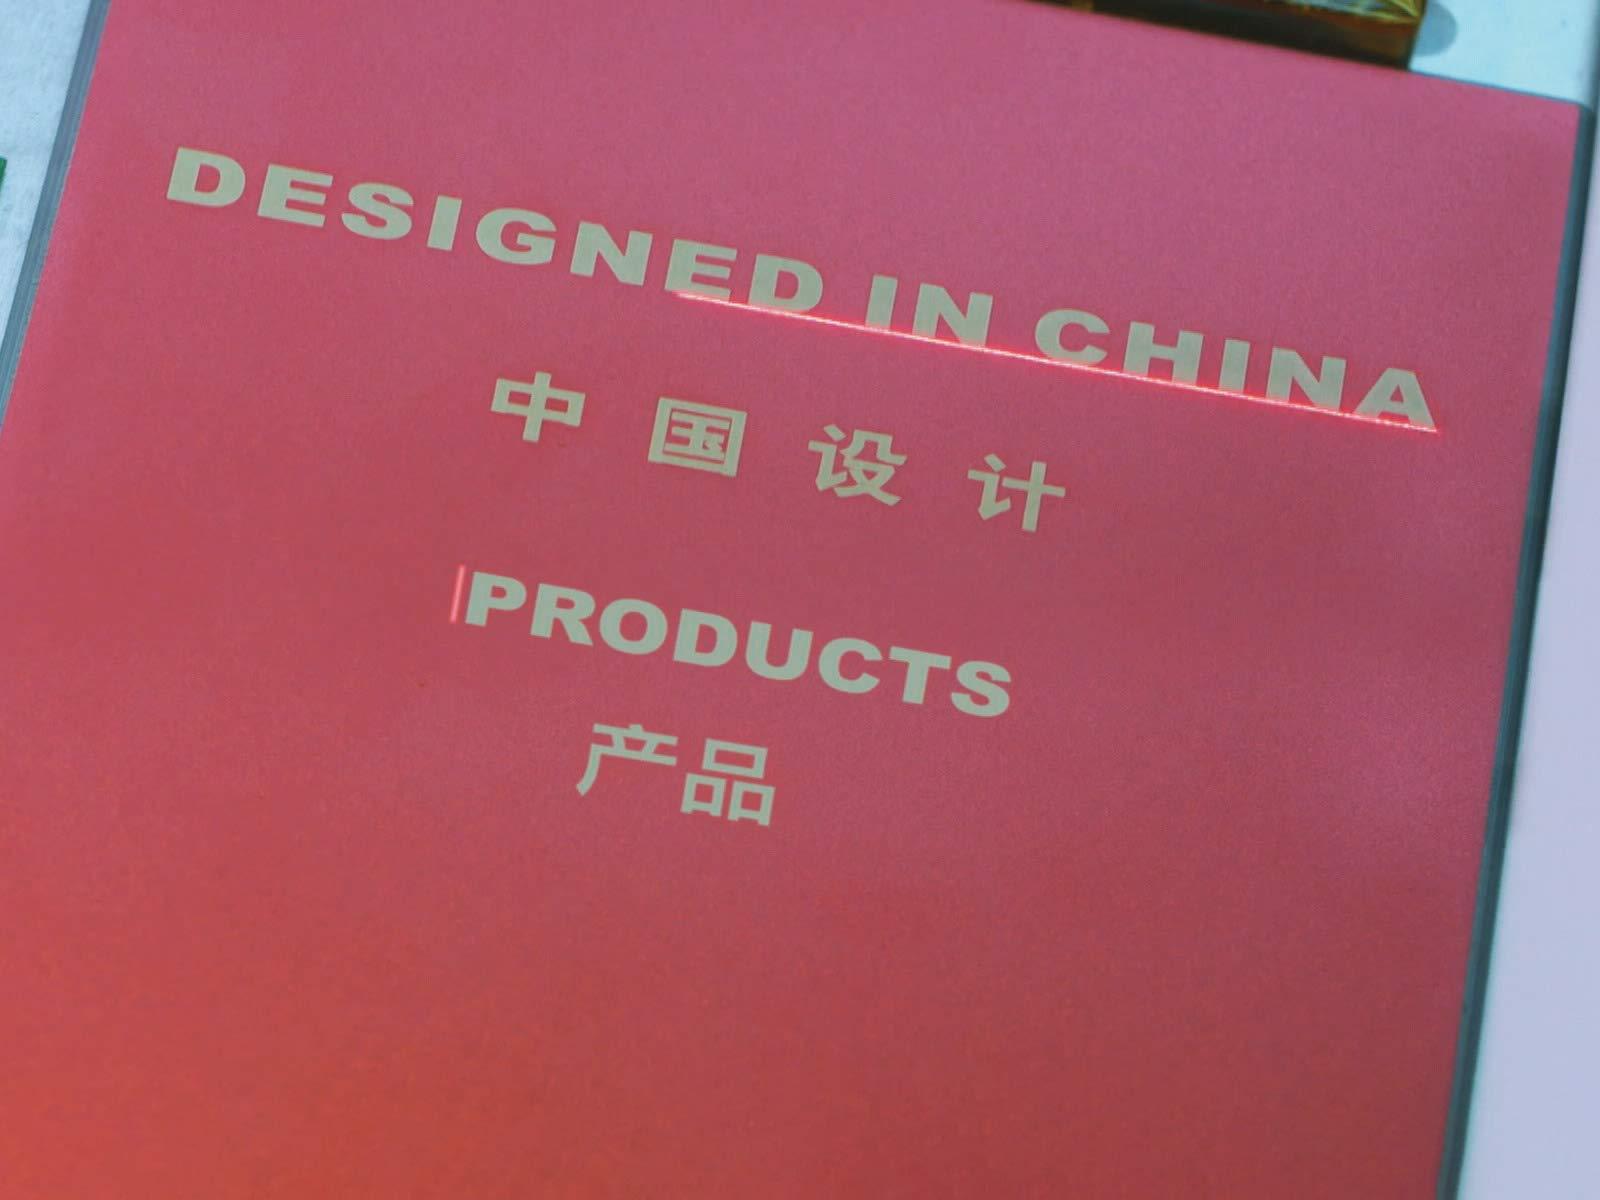 Designed in China on Amazon Prime Video UK